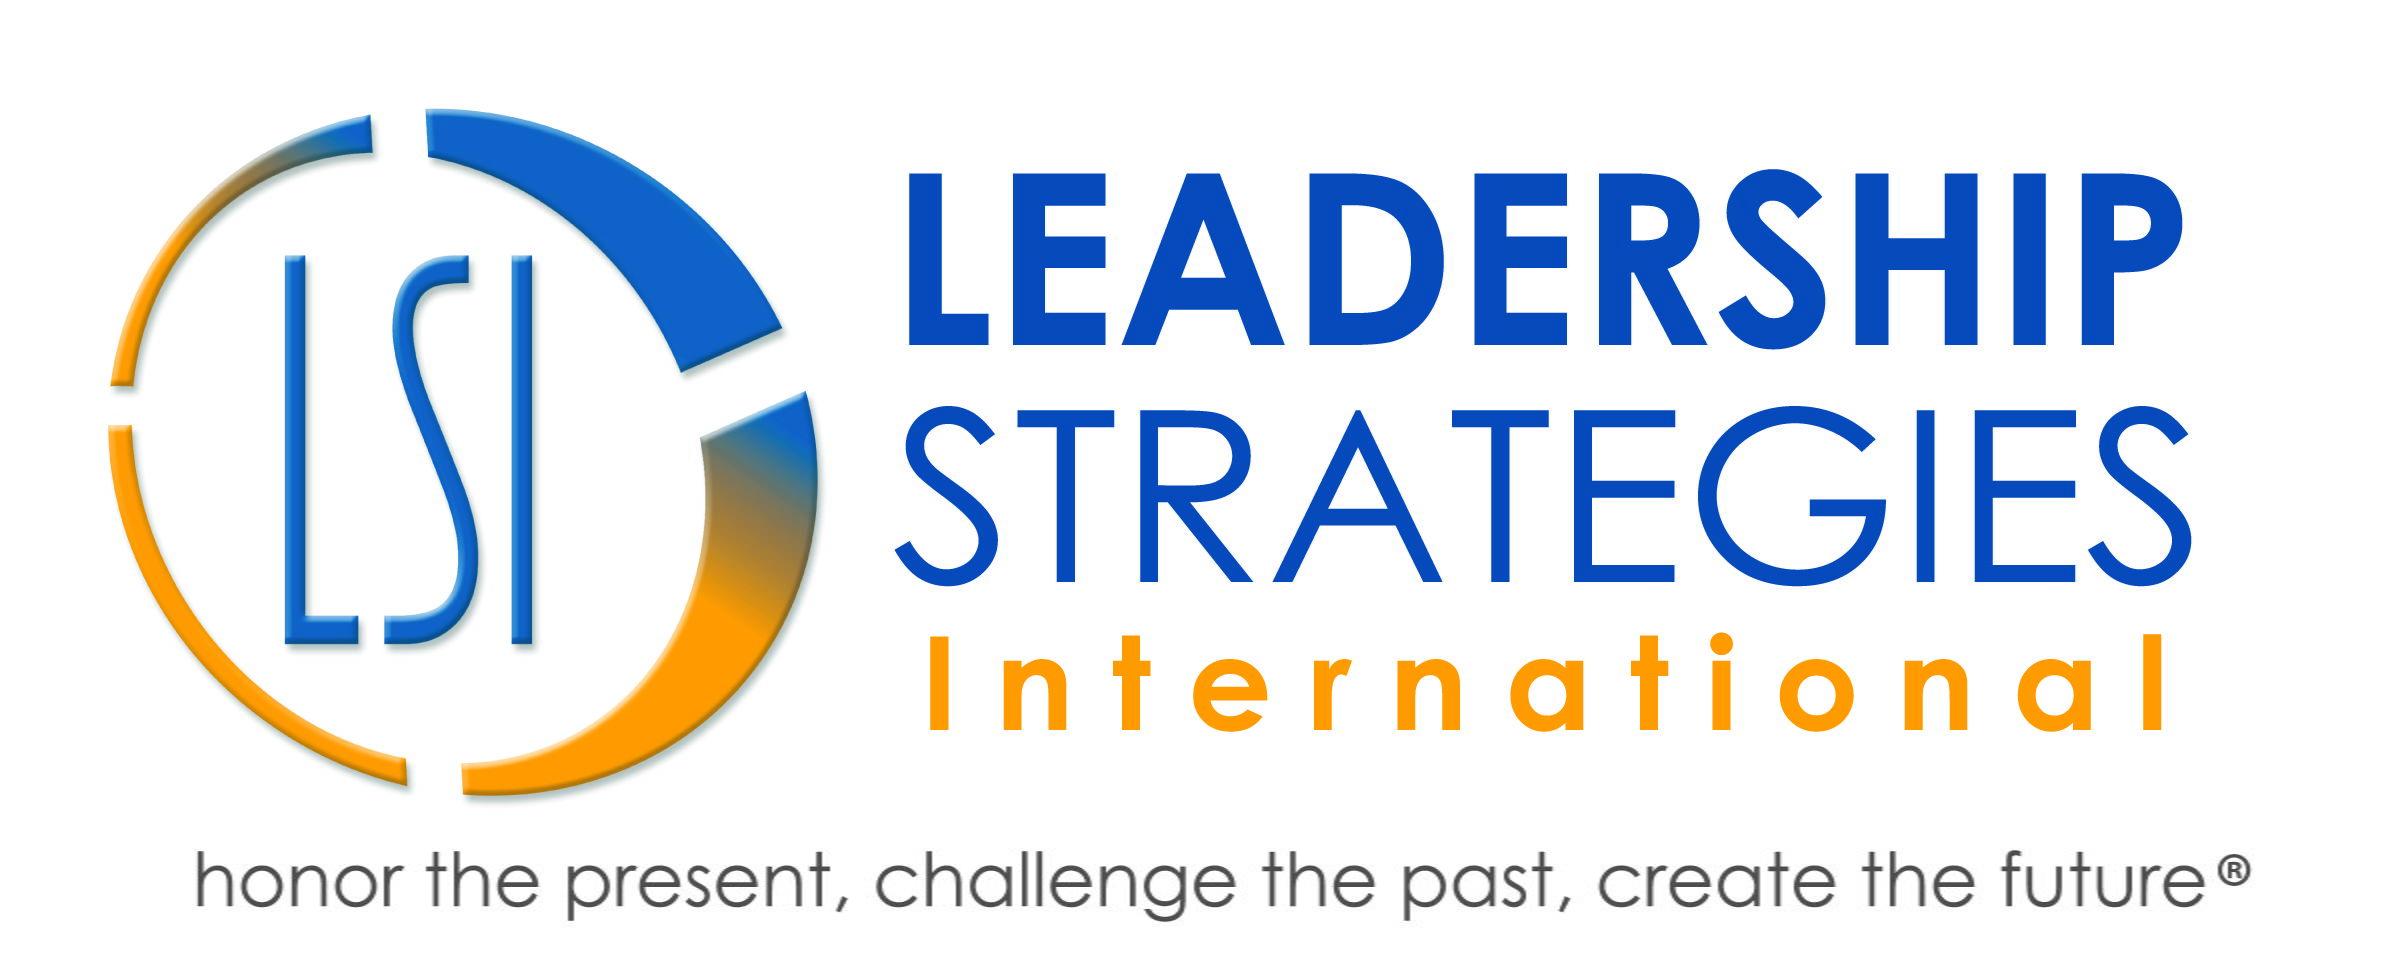 Leadership Strategies International